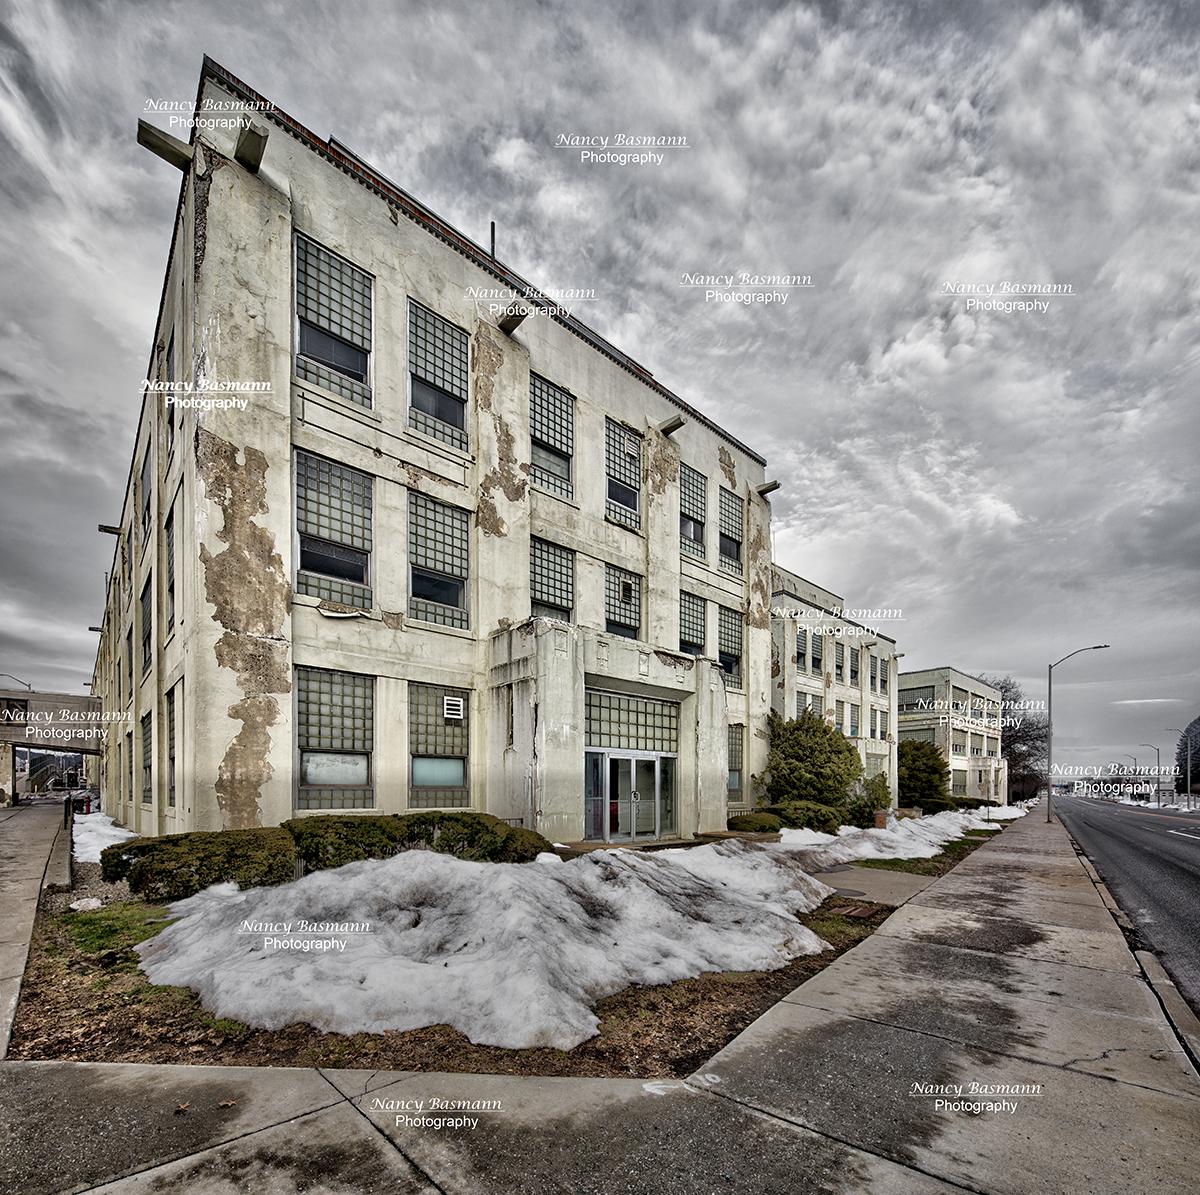 Binghamton Architectural Photography